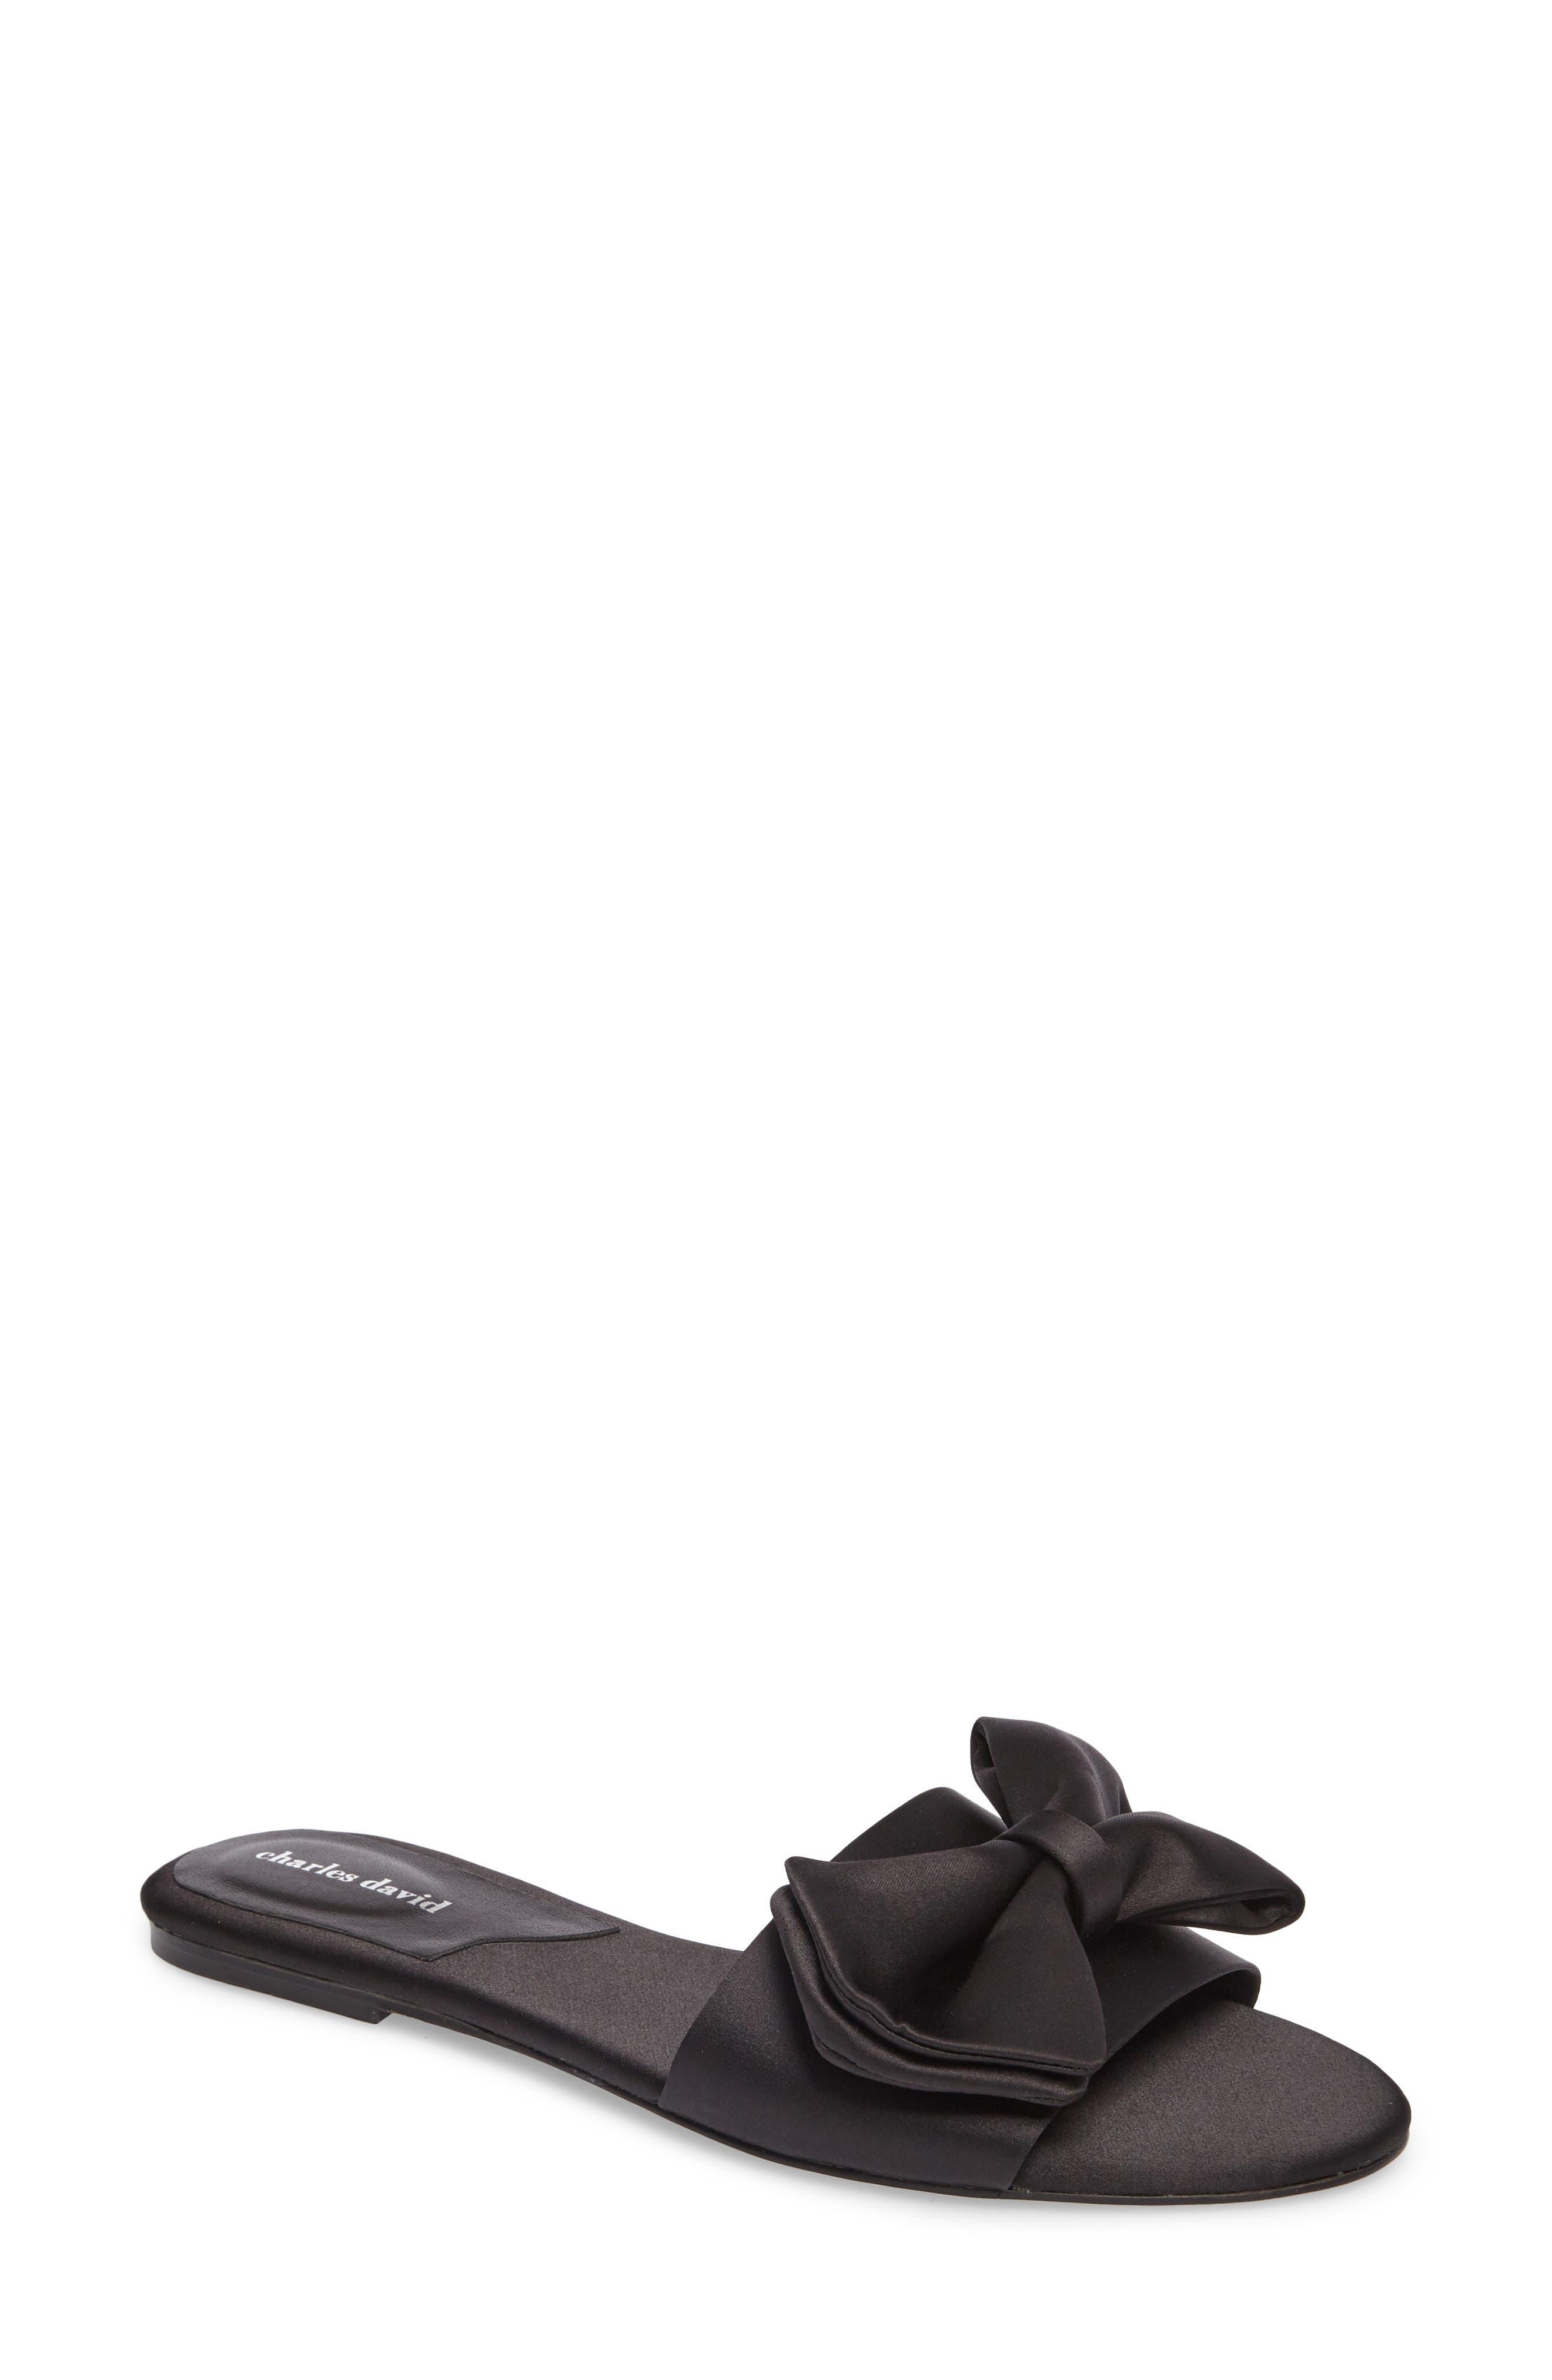 Bow Slide Sandal,                         Main,                         color, Black Satin